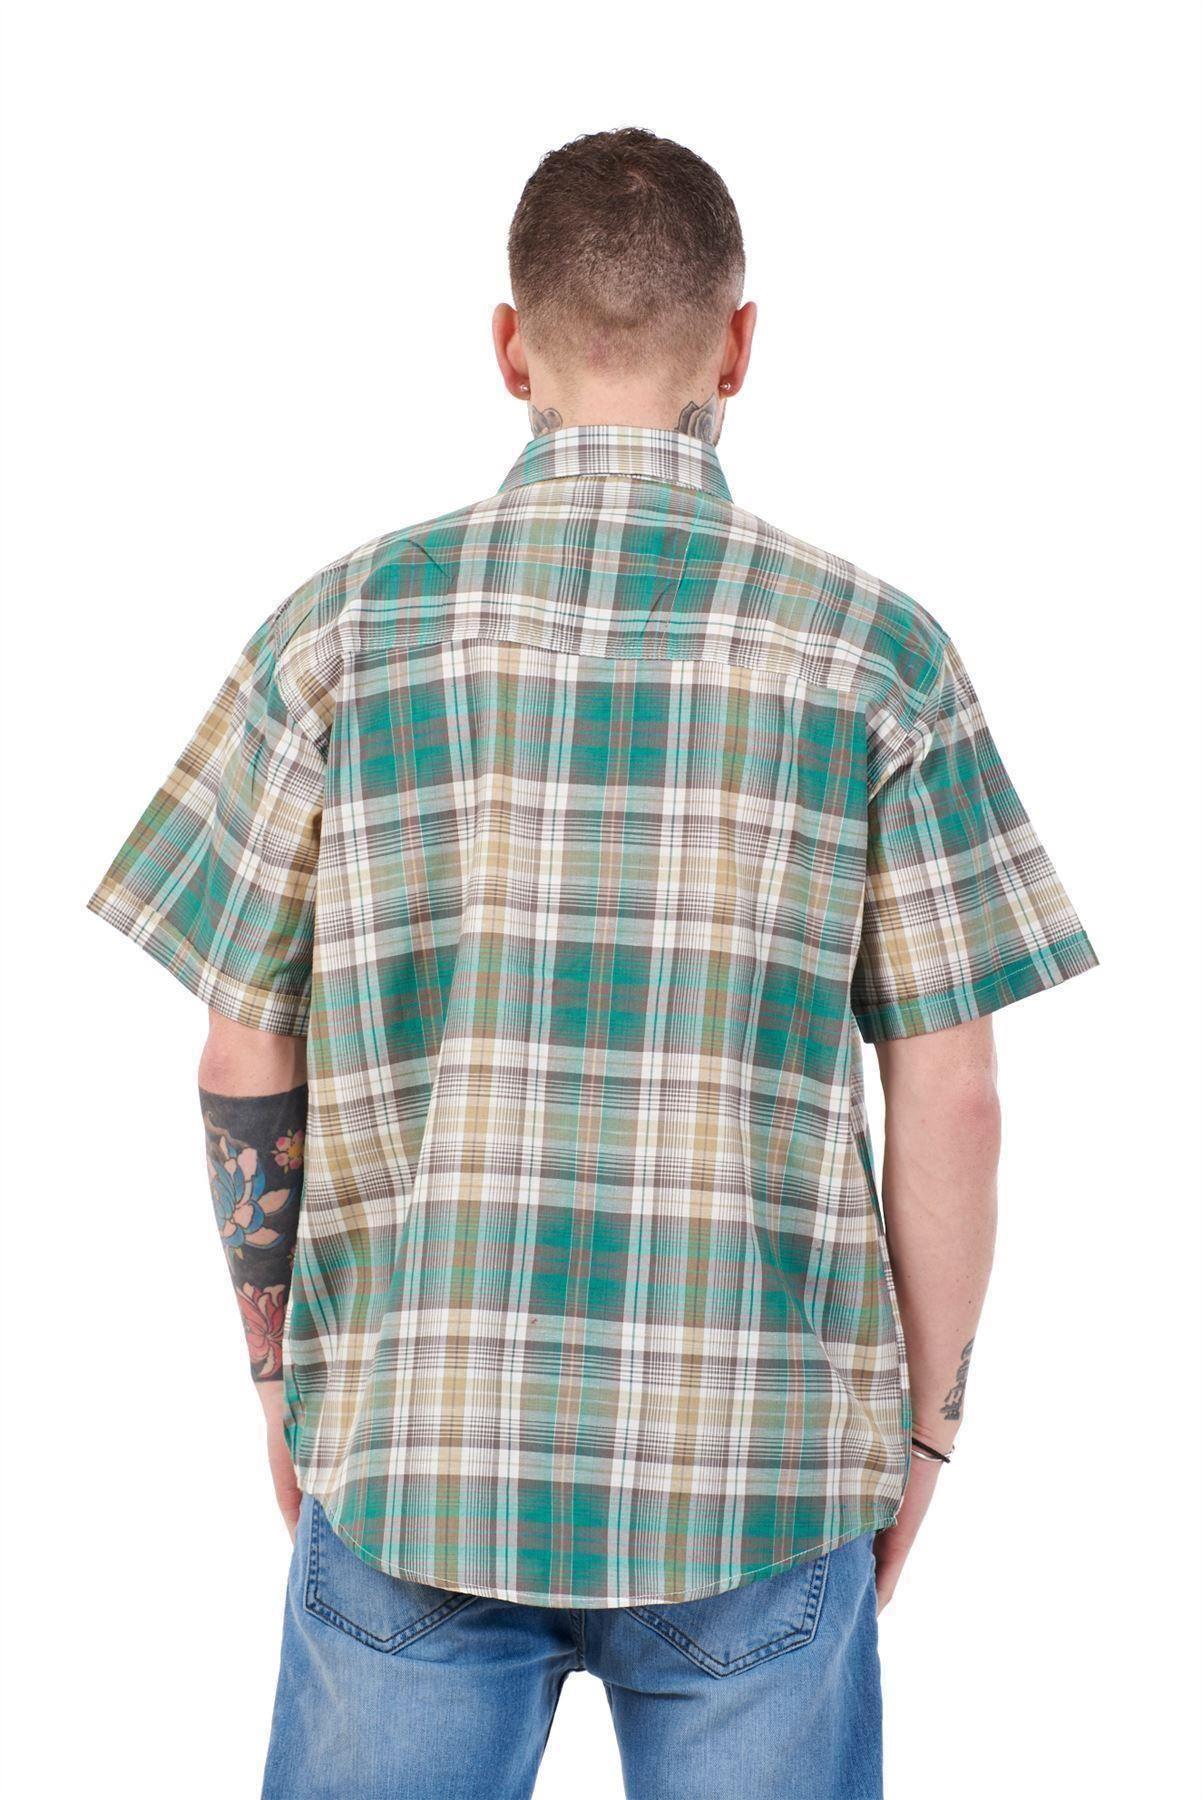 Mens-Regular-Big-Size-Shirts-Checked-Cotton-Blend-Casual-Short-Sleeve-Blue-M-5XL thumbnail 15